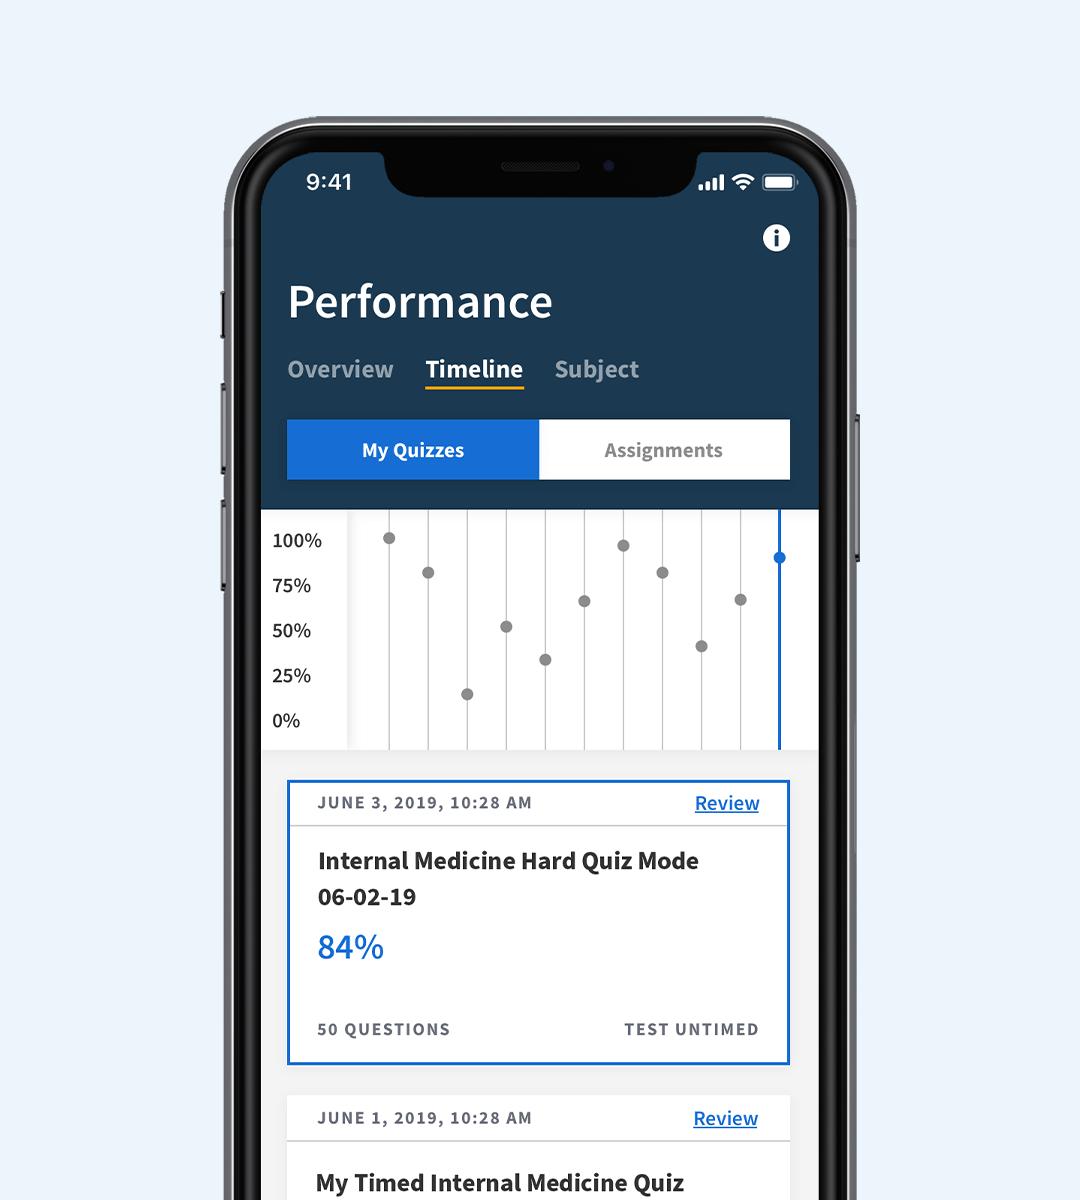 boardvitals performance timeline